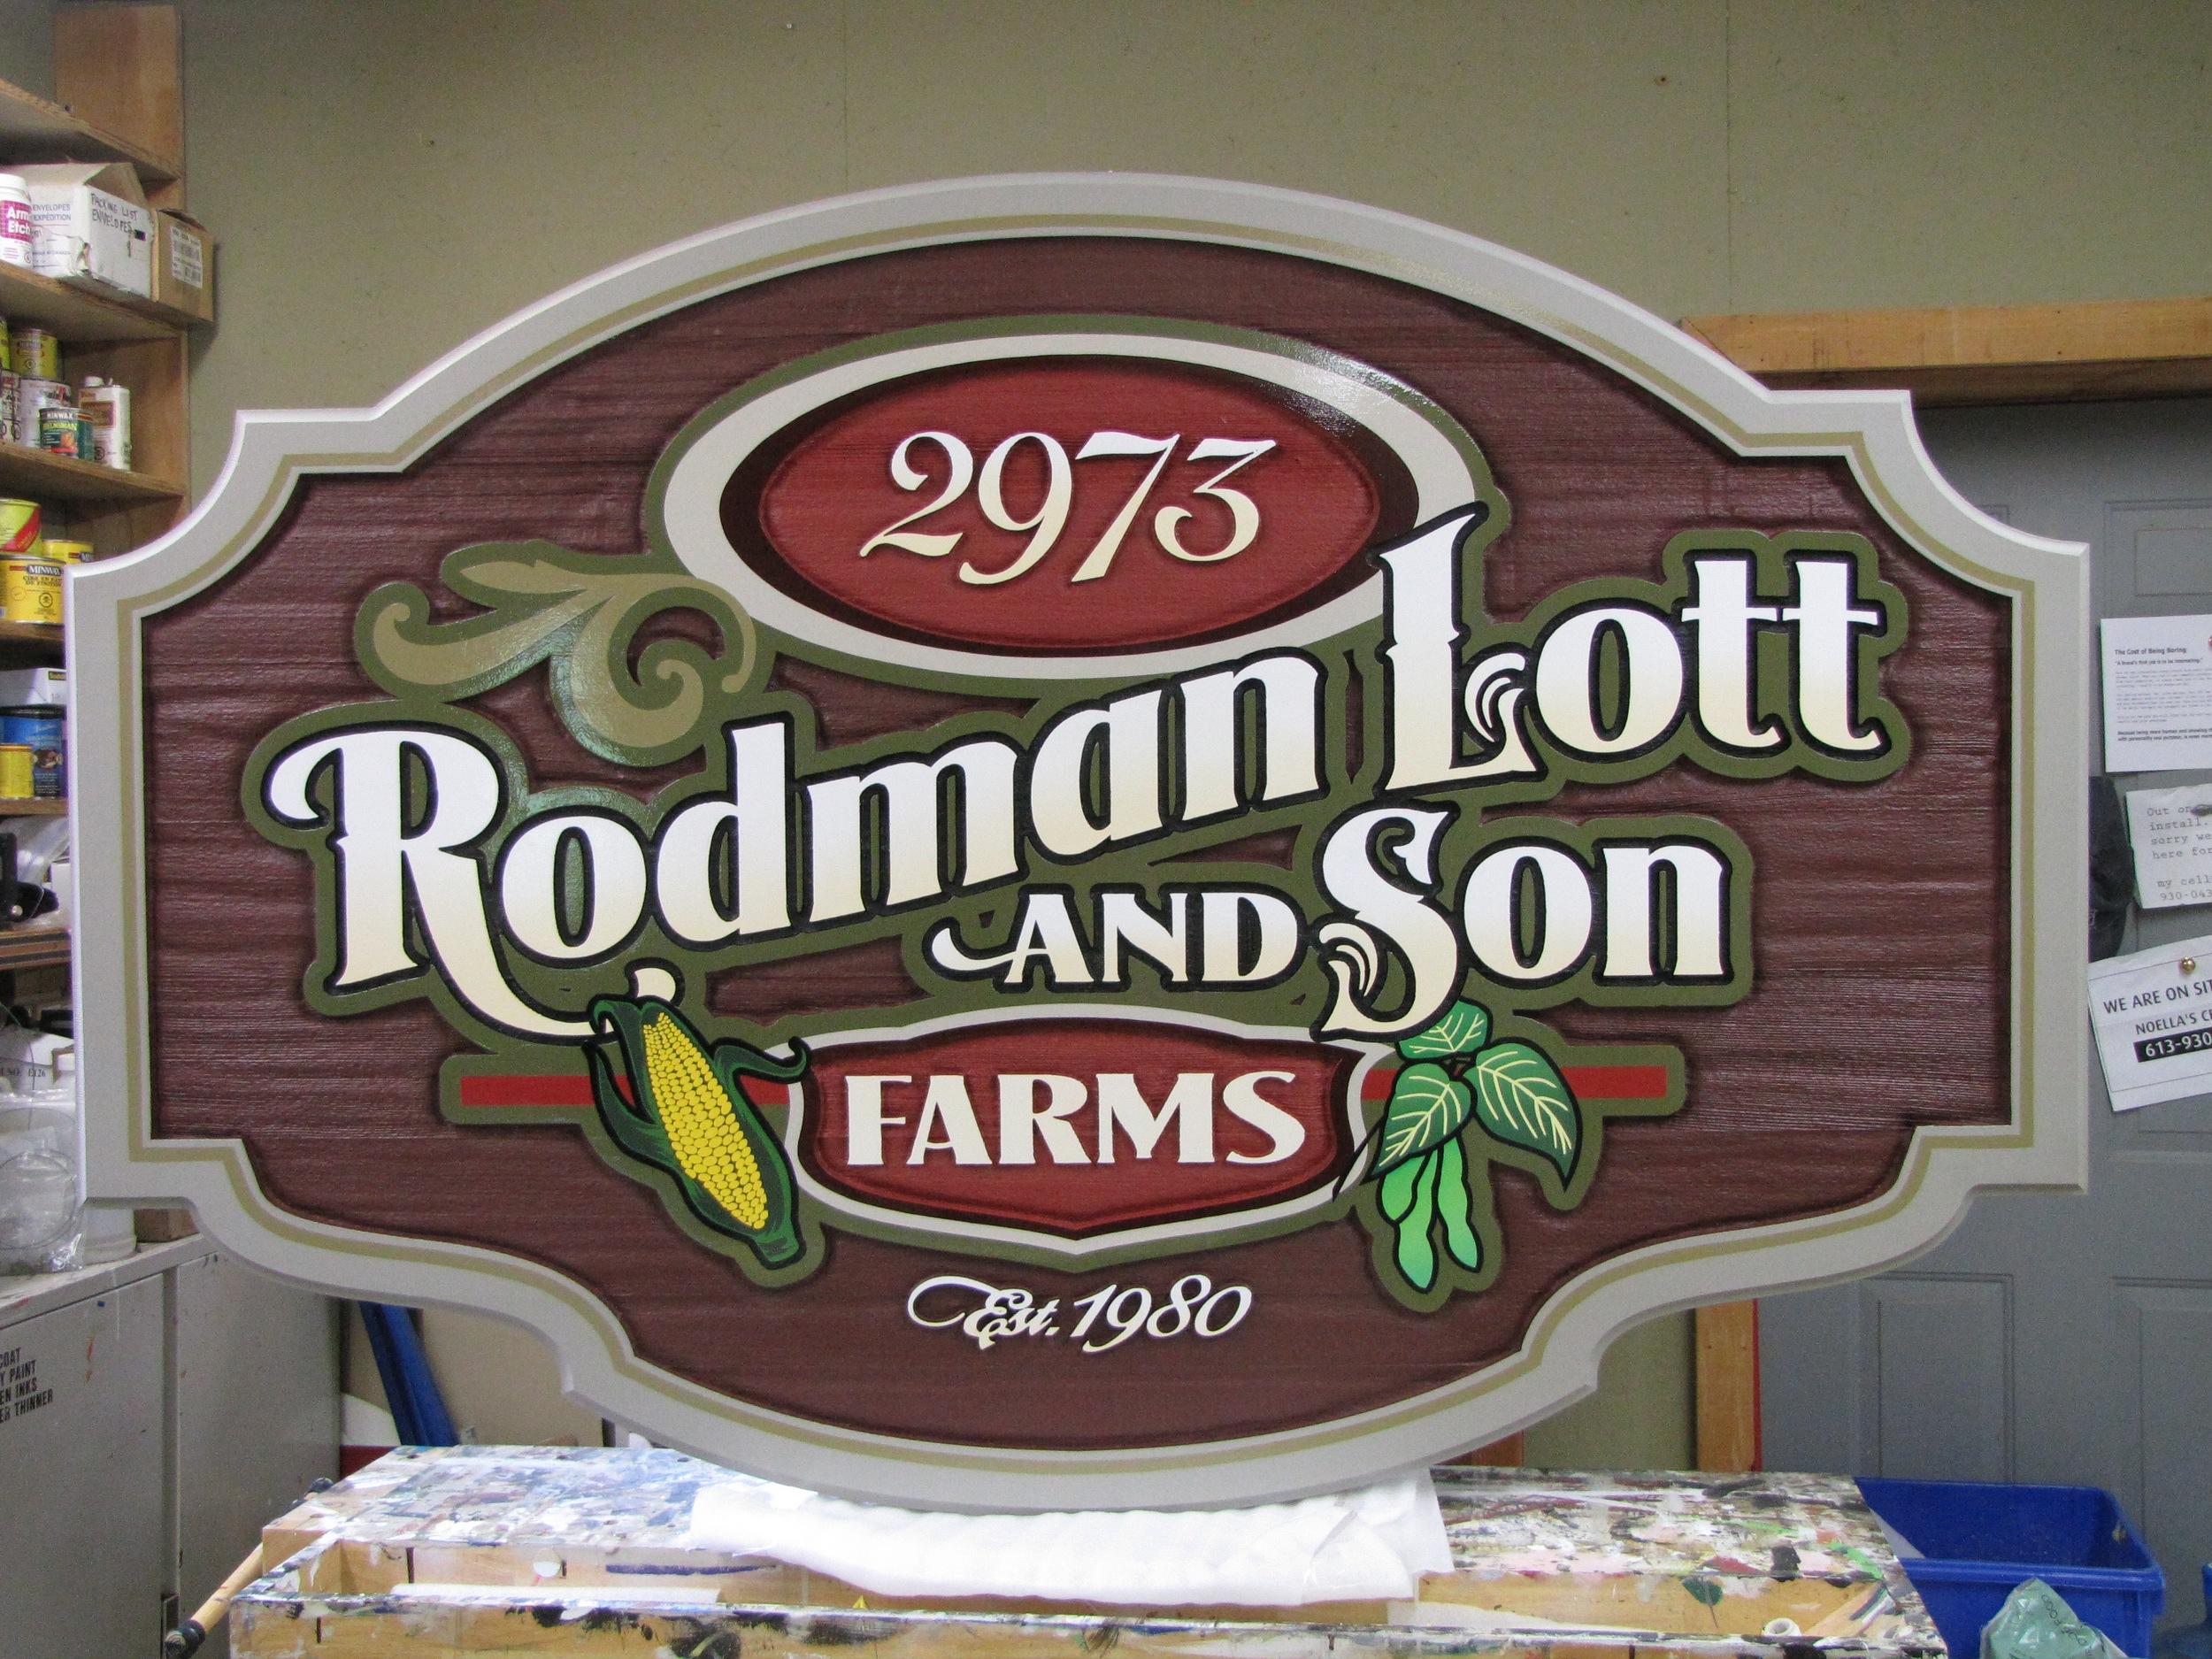 rodman Lott.jpg